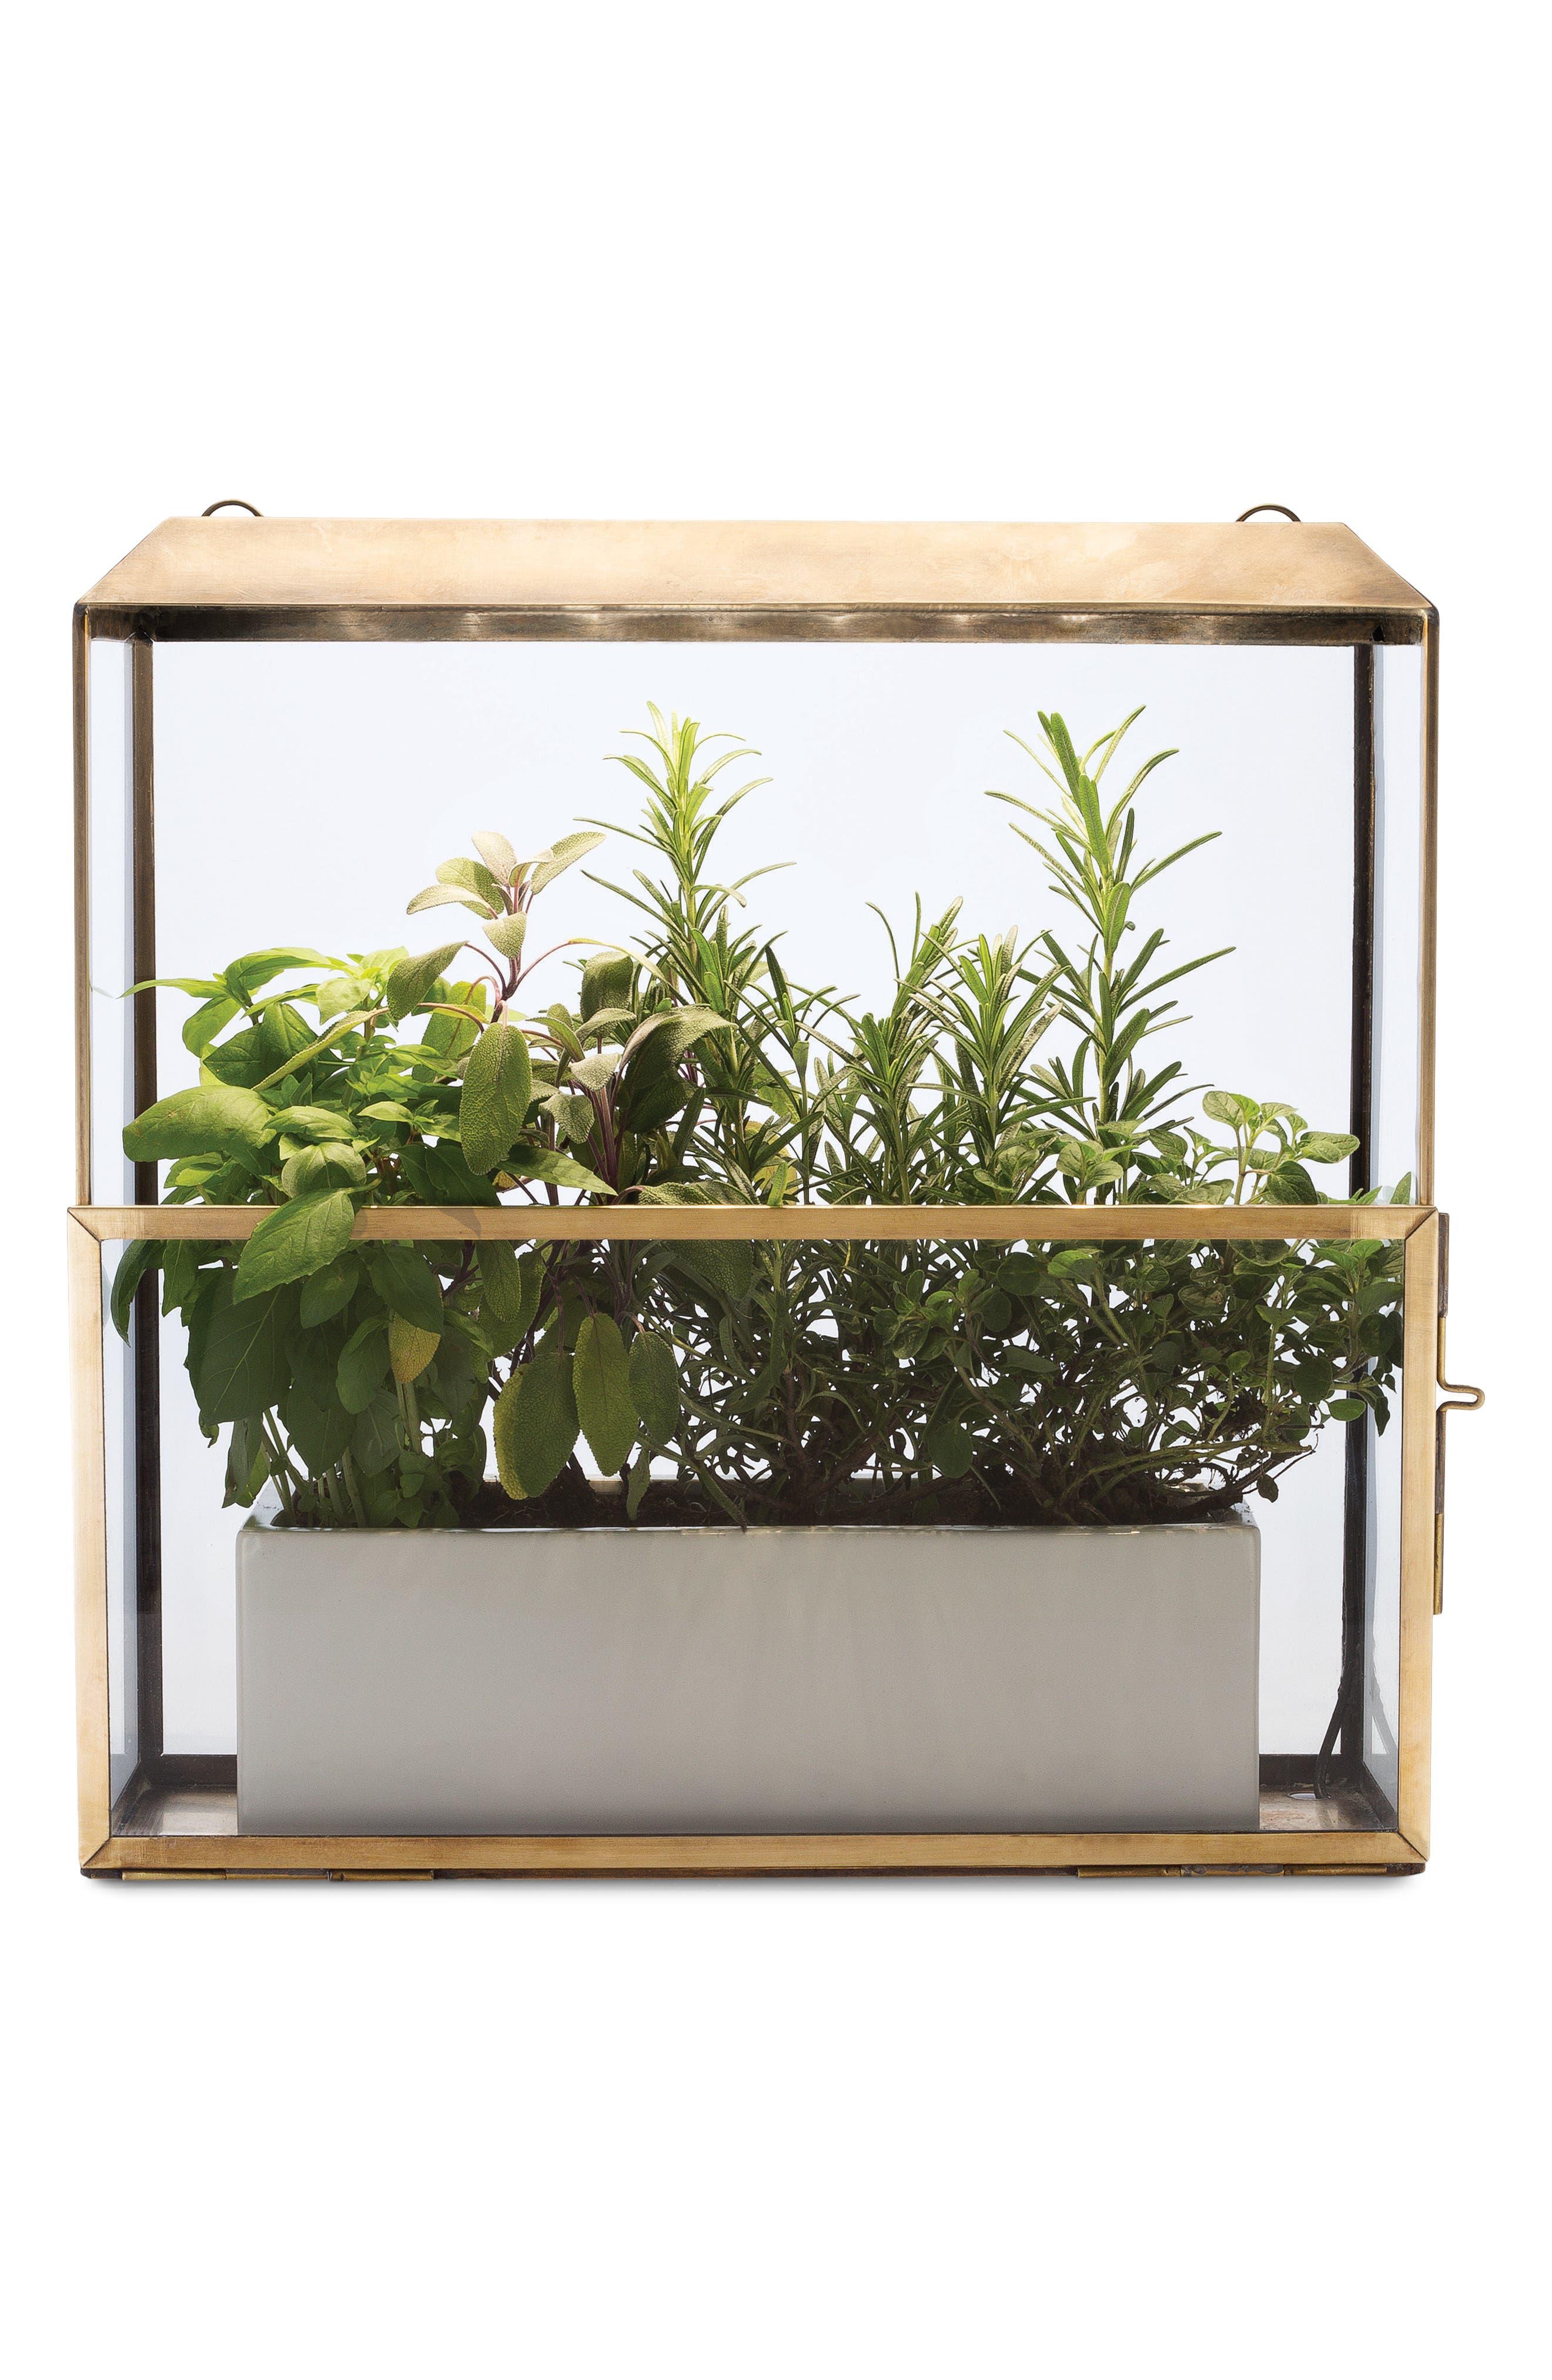 Growhouse Greenhouse & Growlight,                             Alternate thumbnail 6, color,                             Brass N Glass